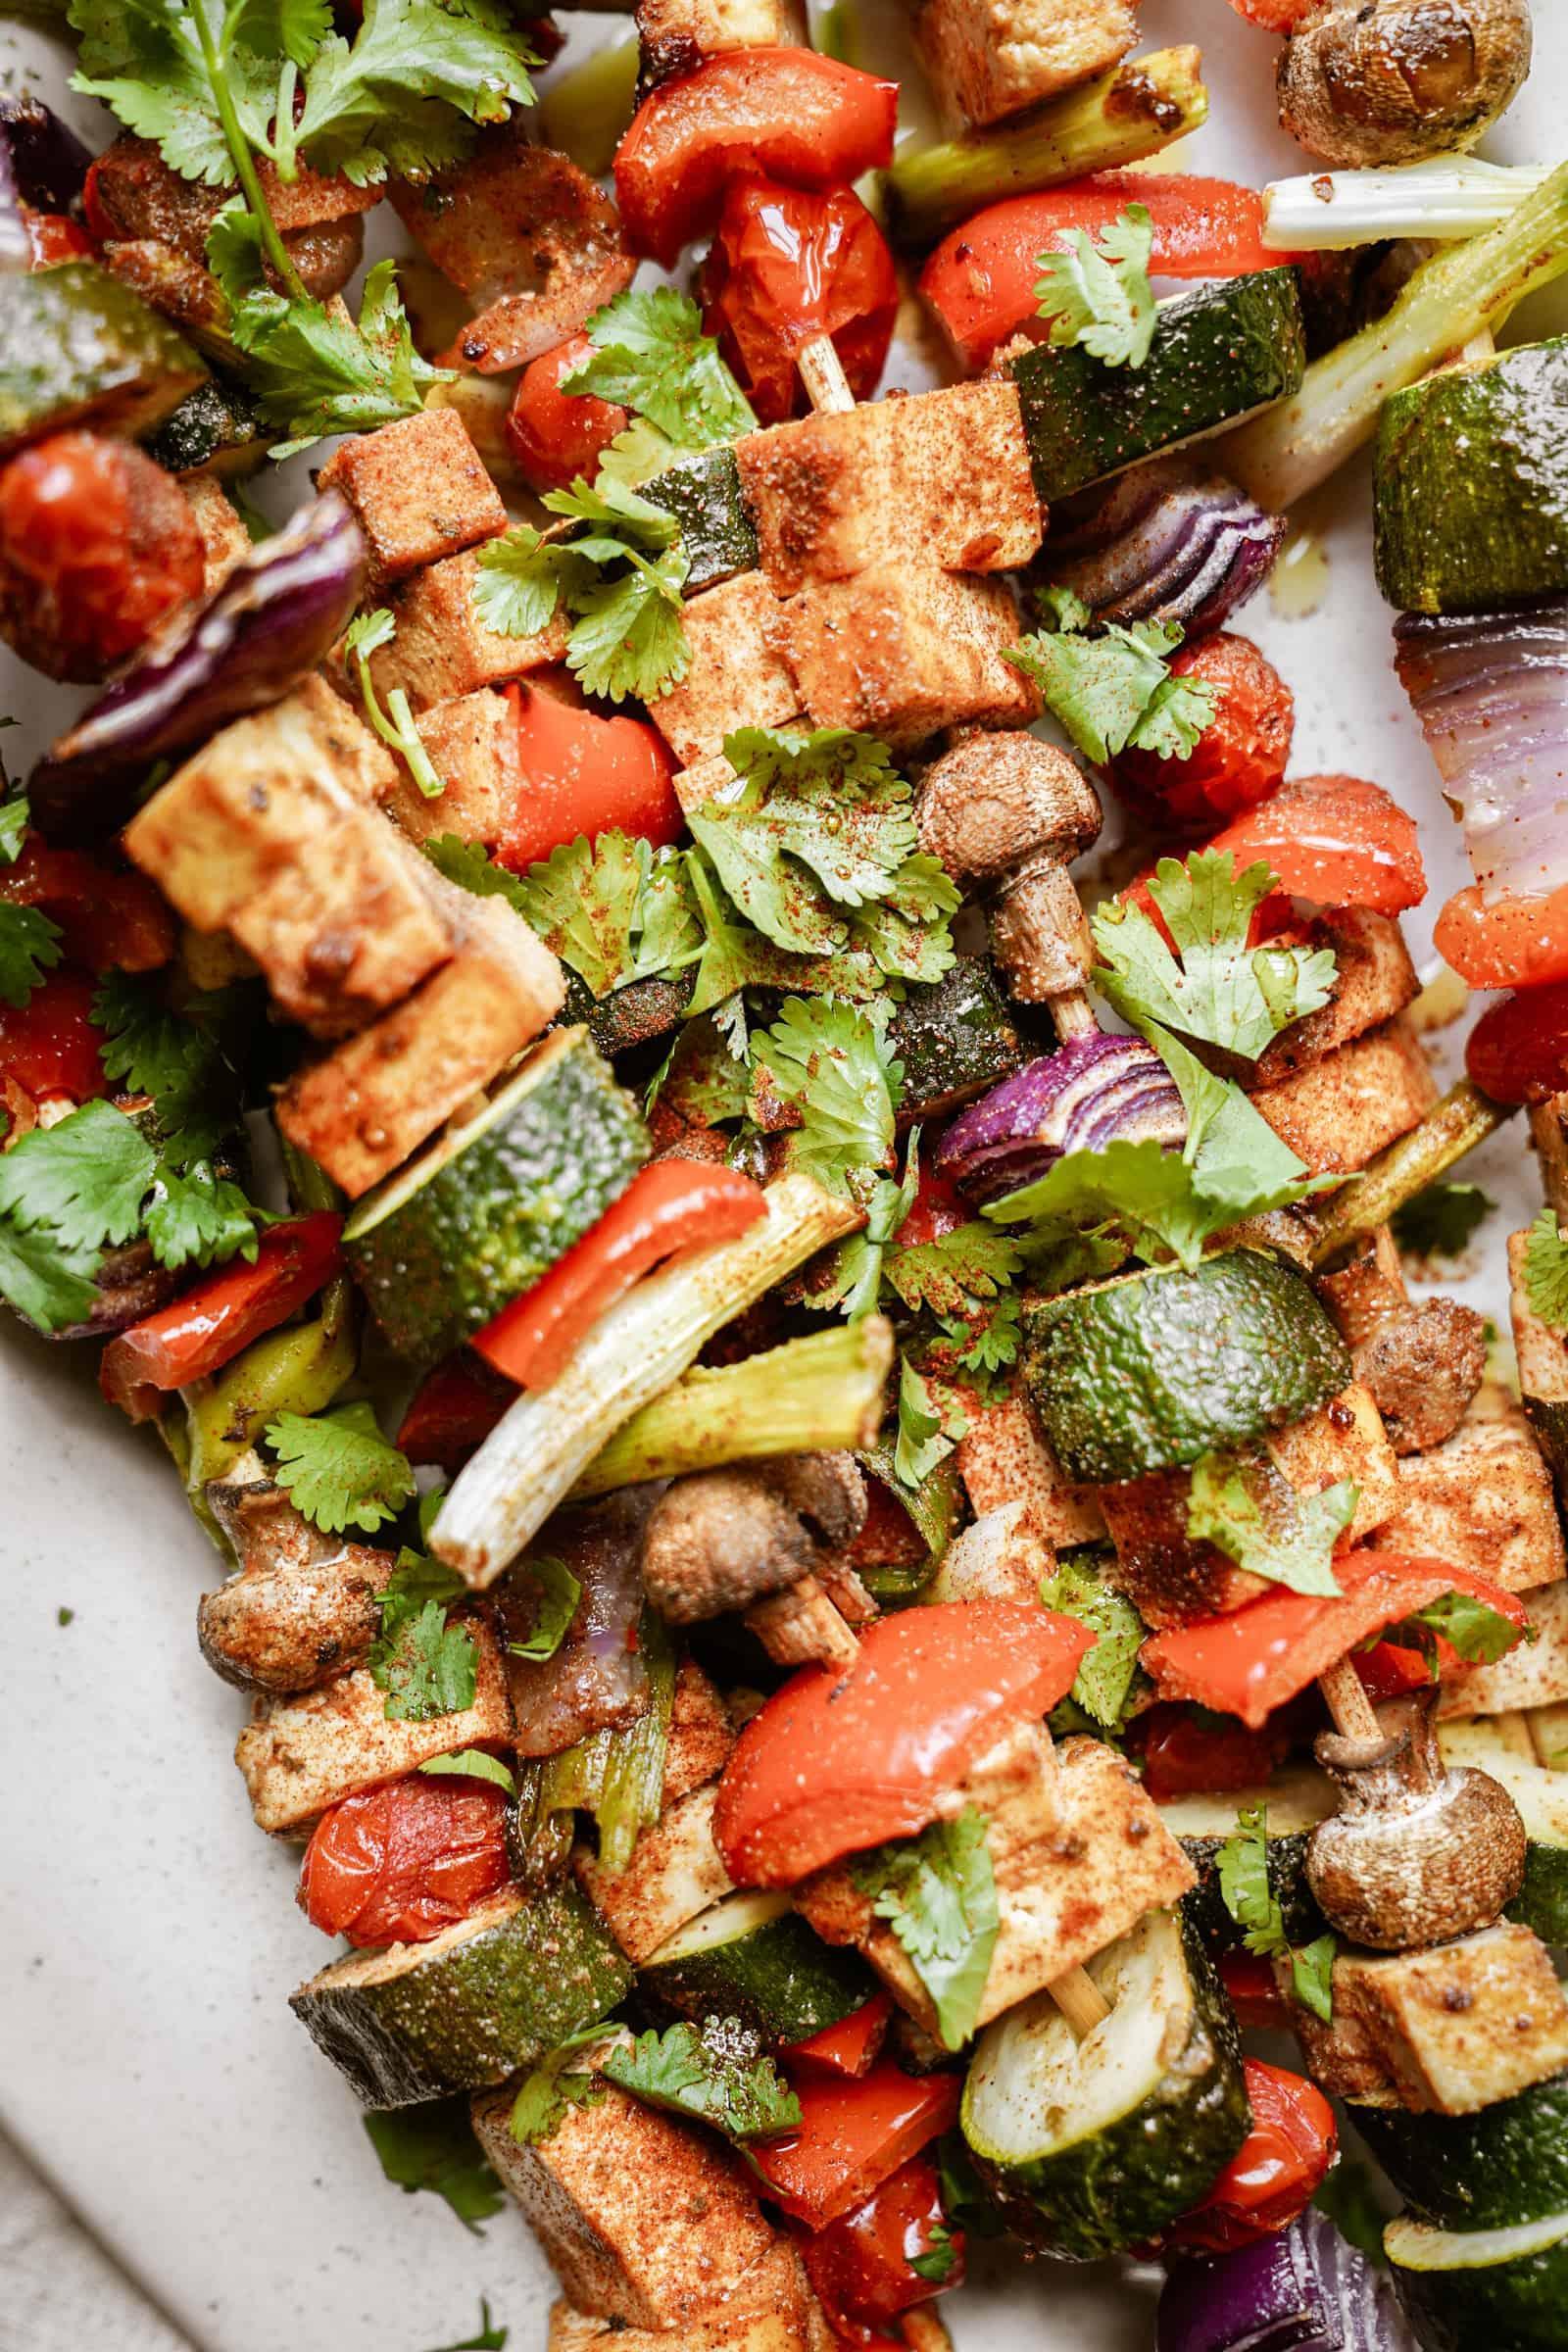 Marinated Tofu and Vegetable Skewers on tray